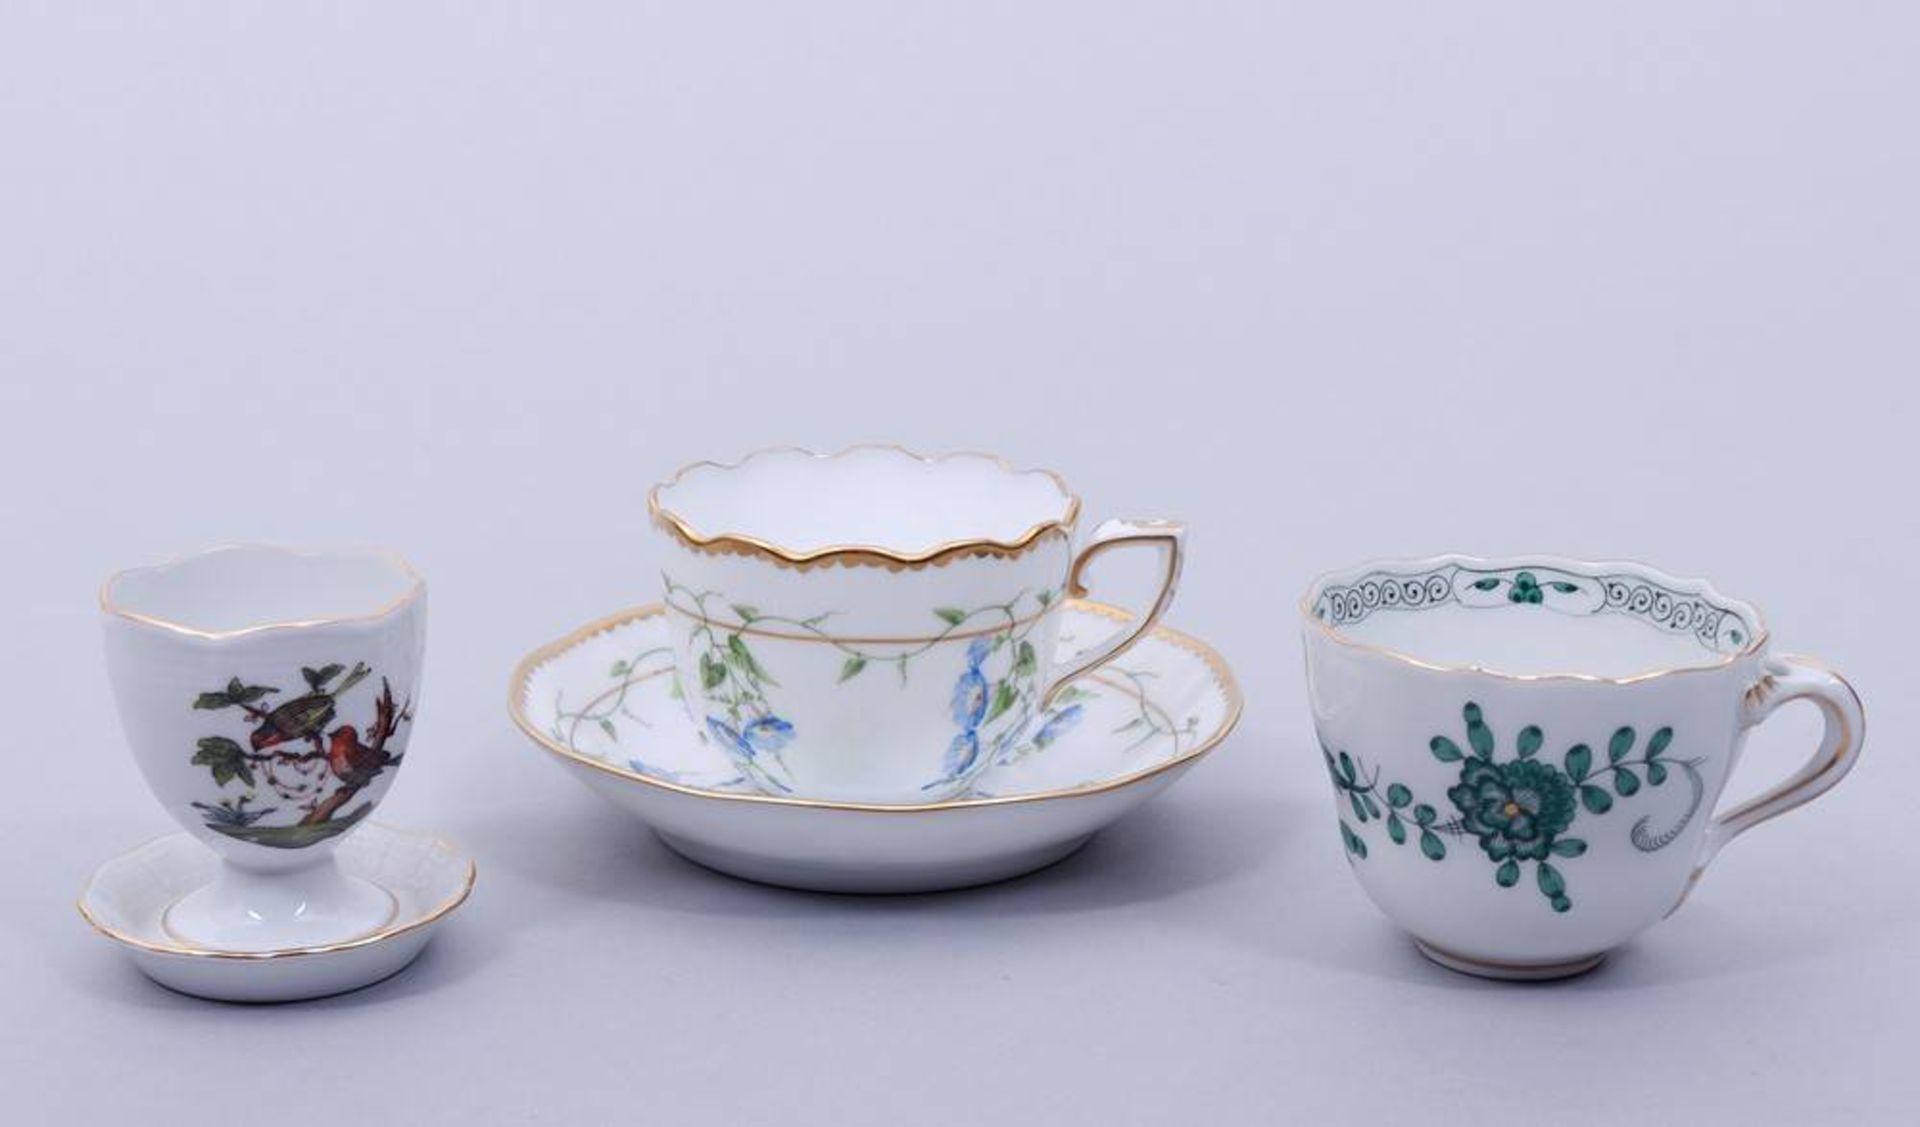 Kleines Konvolut, Herend, 20. Jh., variierende Dekore, 4 Tassen mit UT, 1 Eierb - Image 4 of 8